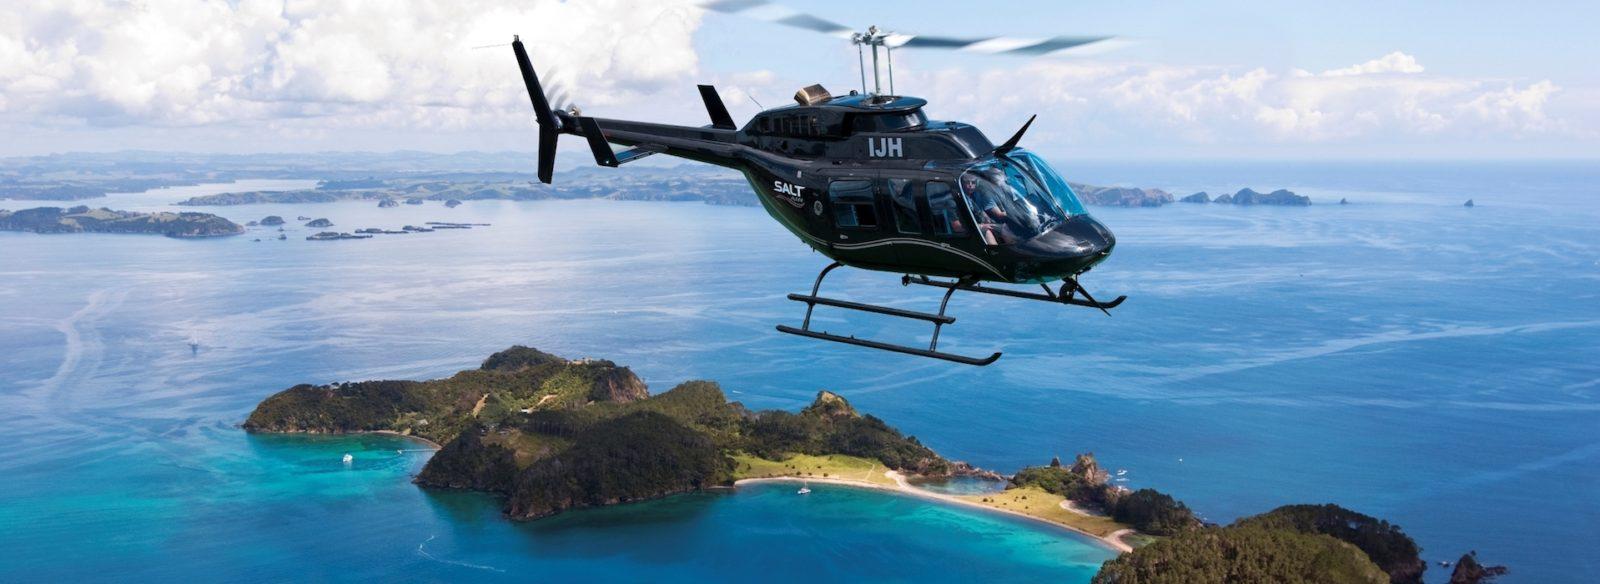 Salt Air helicopter flights